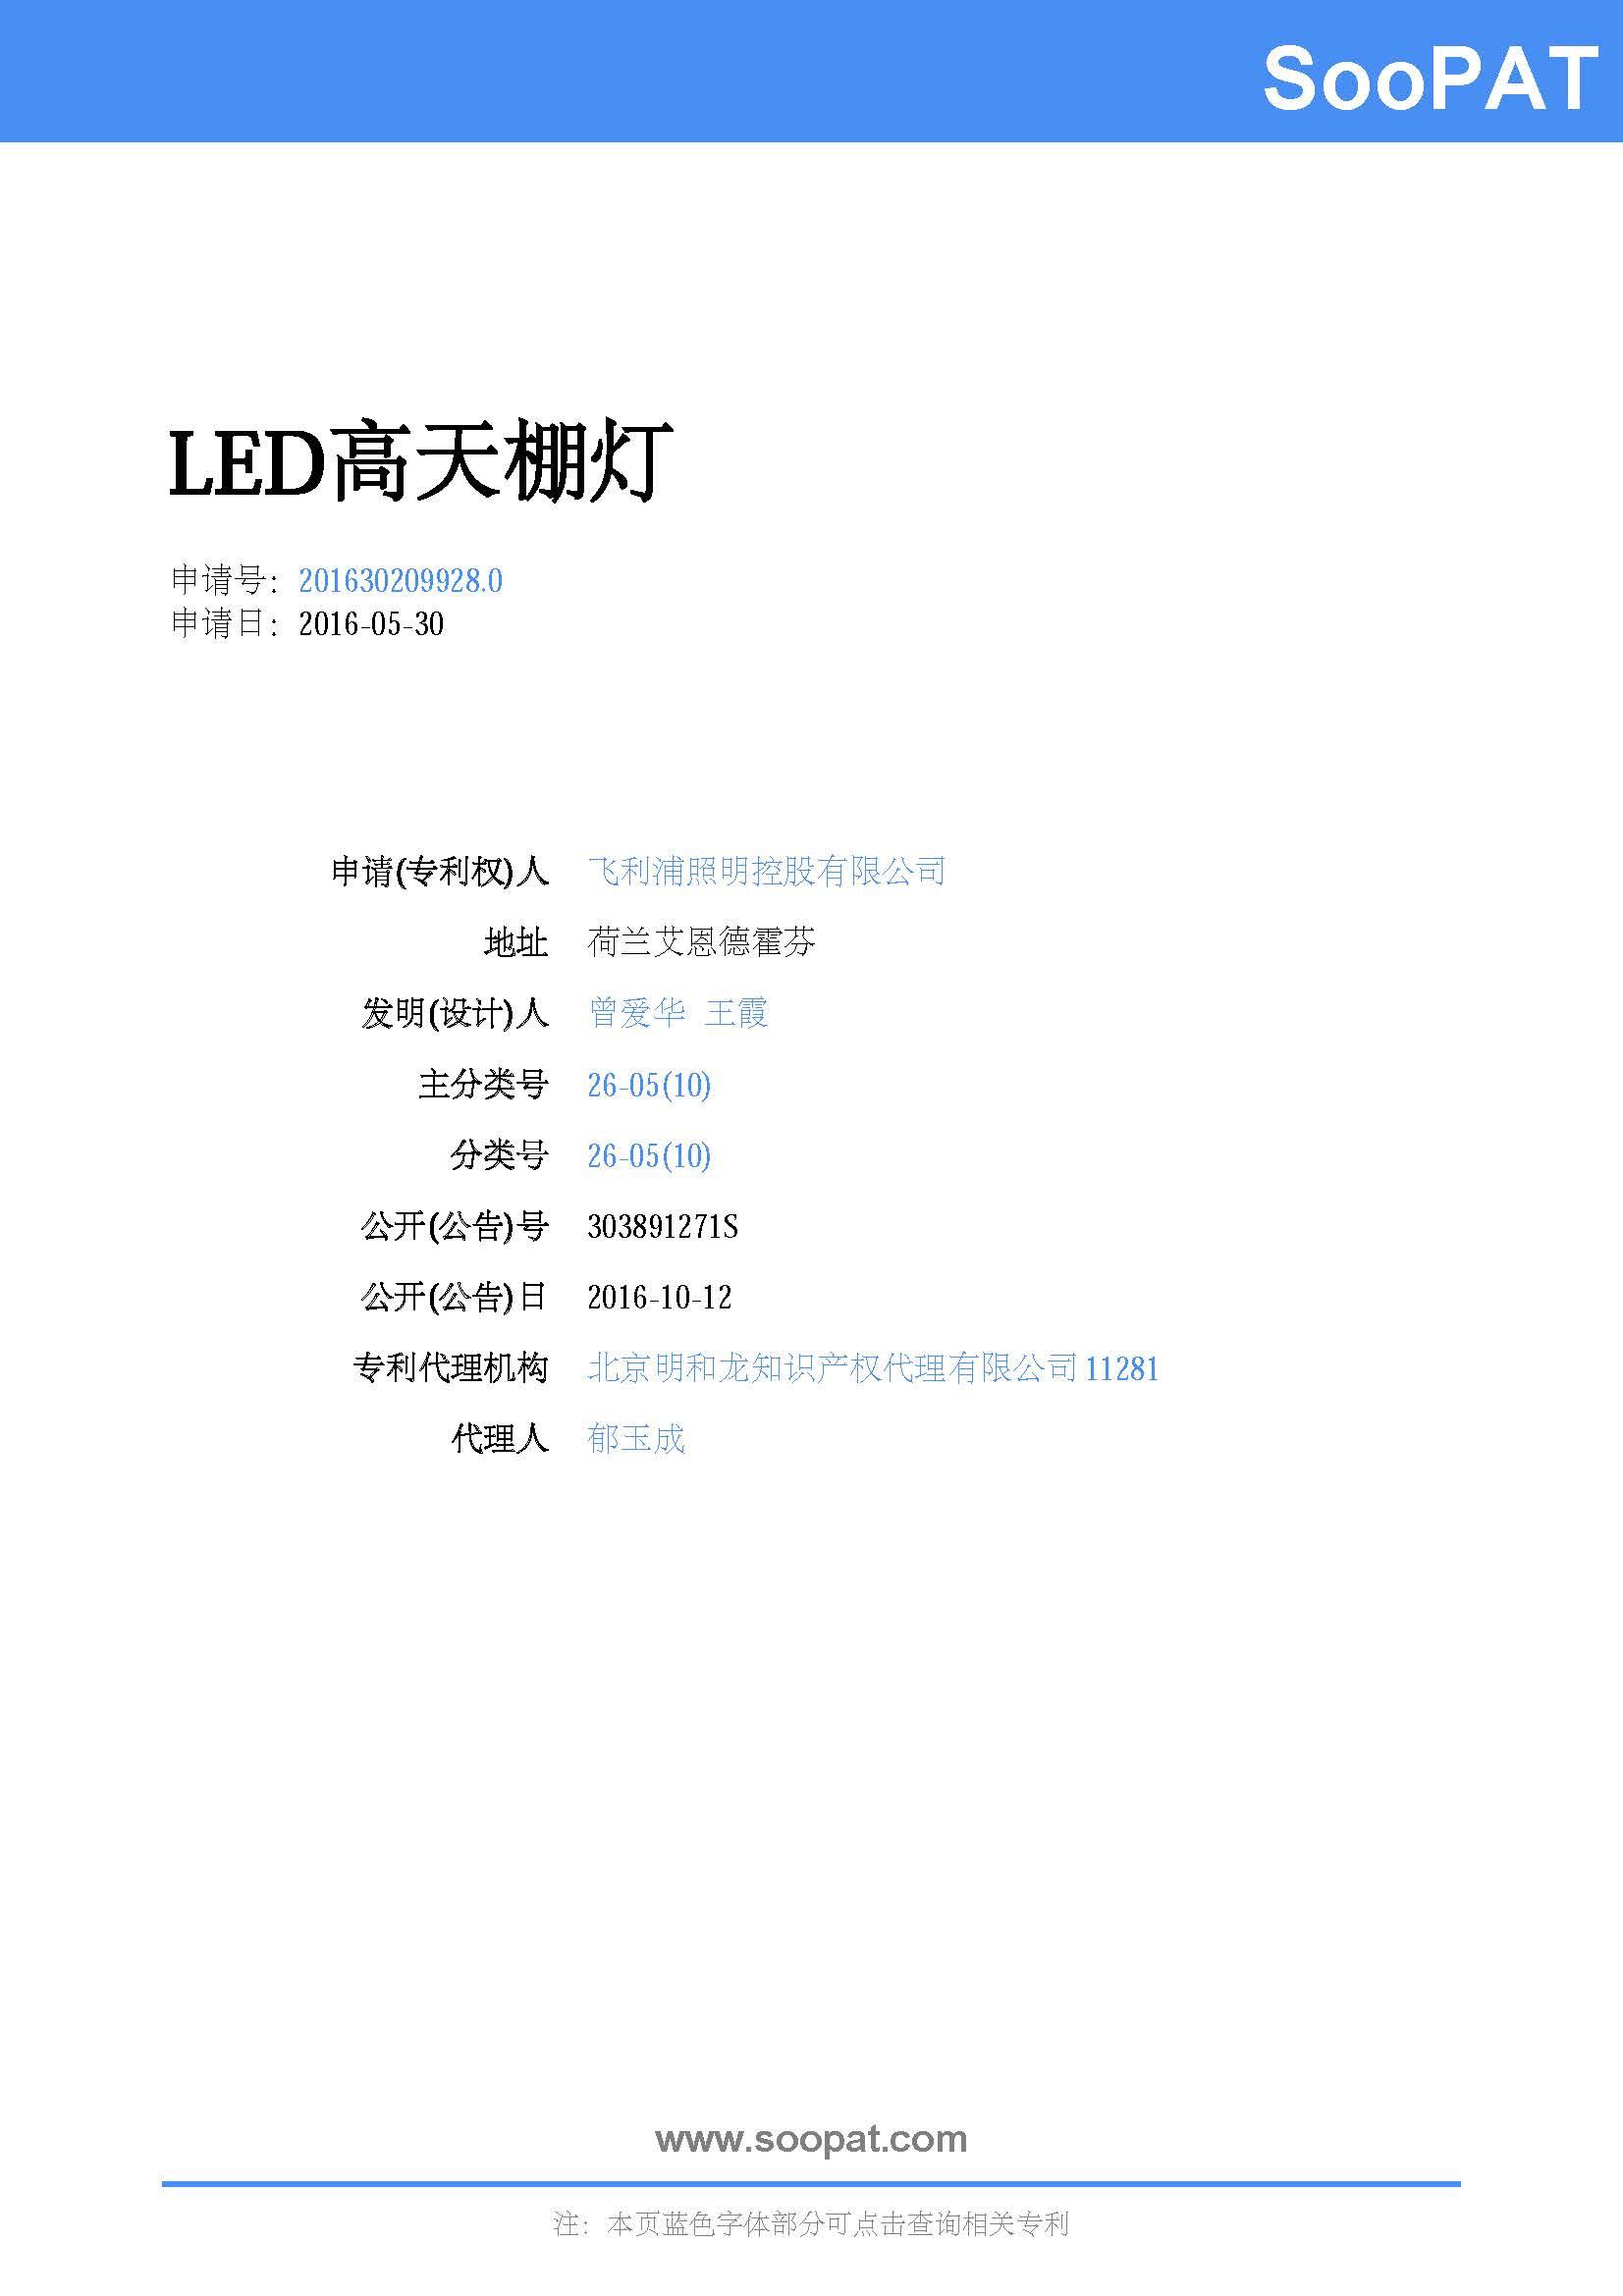 CN201630209928-LED高天棚燈-外觀專利_頁面_1.jpg